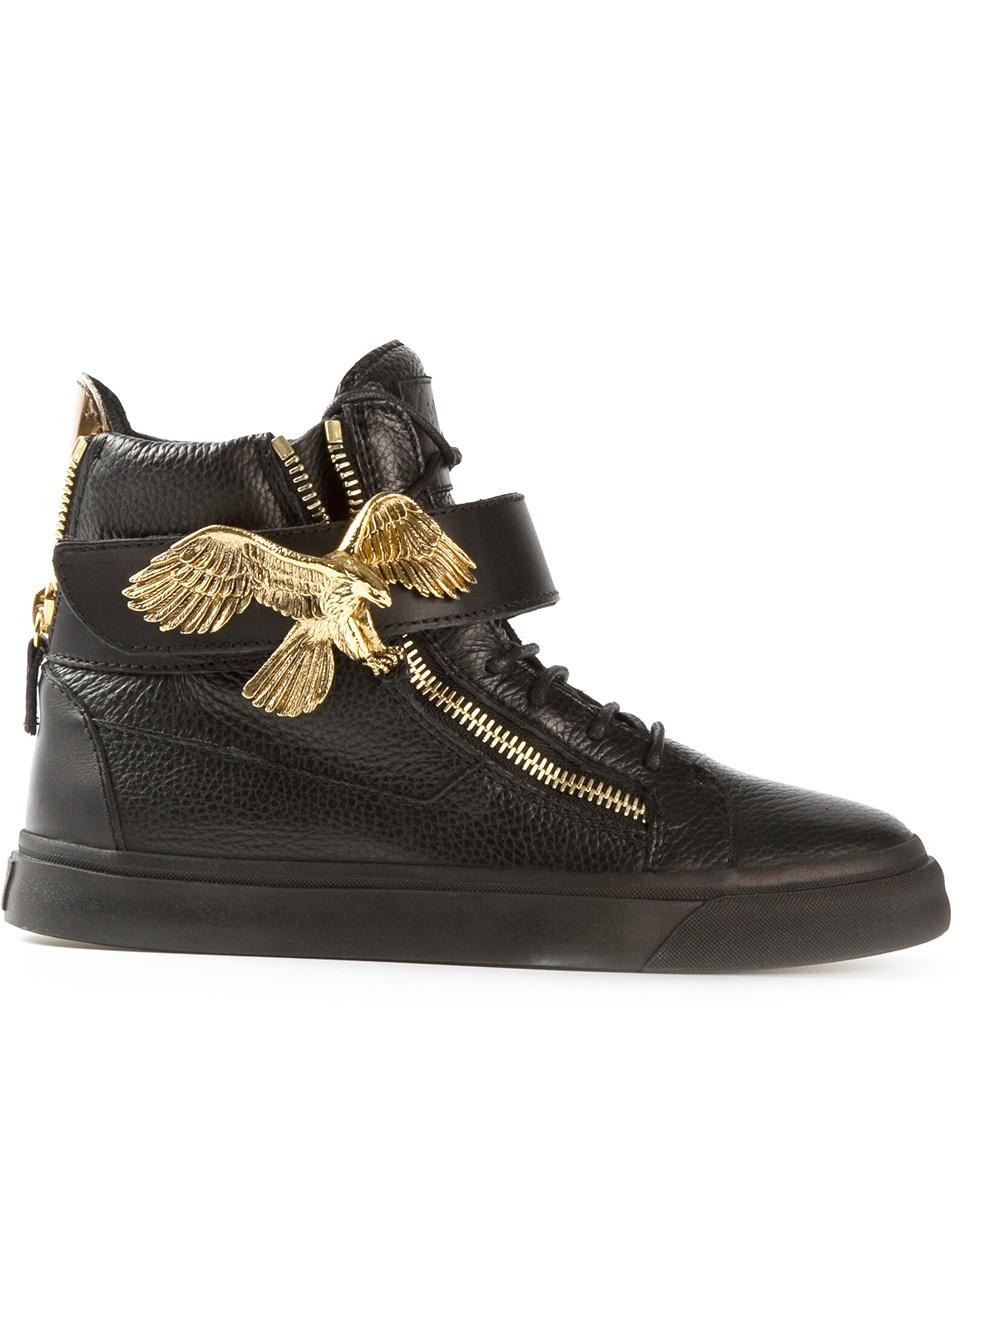 giuseppe zanotti eagle detail hi top sneaker in black lyst. Black Bedroom Furniture Sets. Home Design Ideas